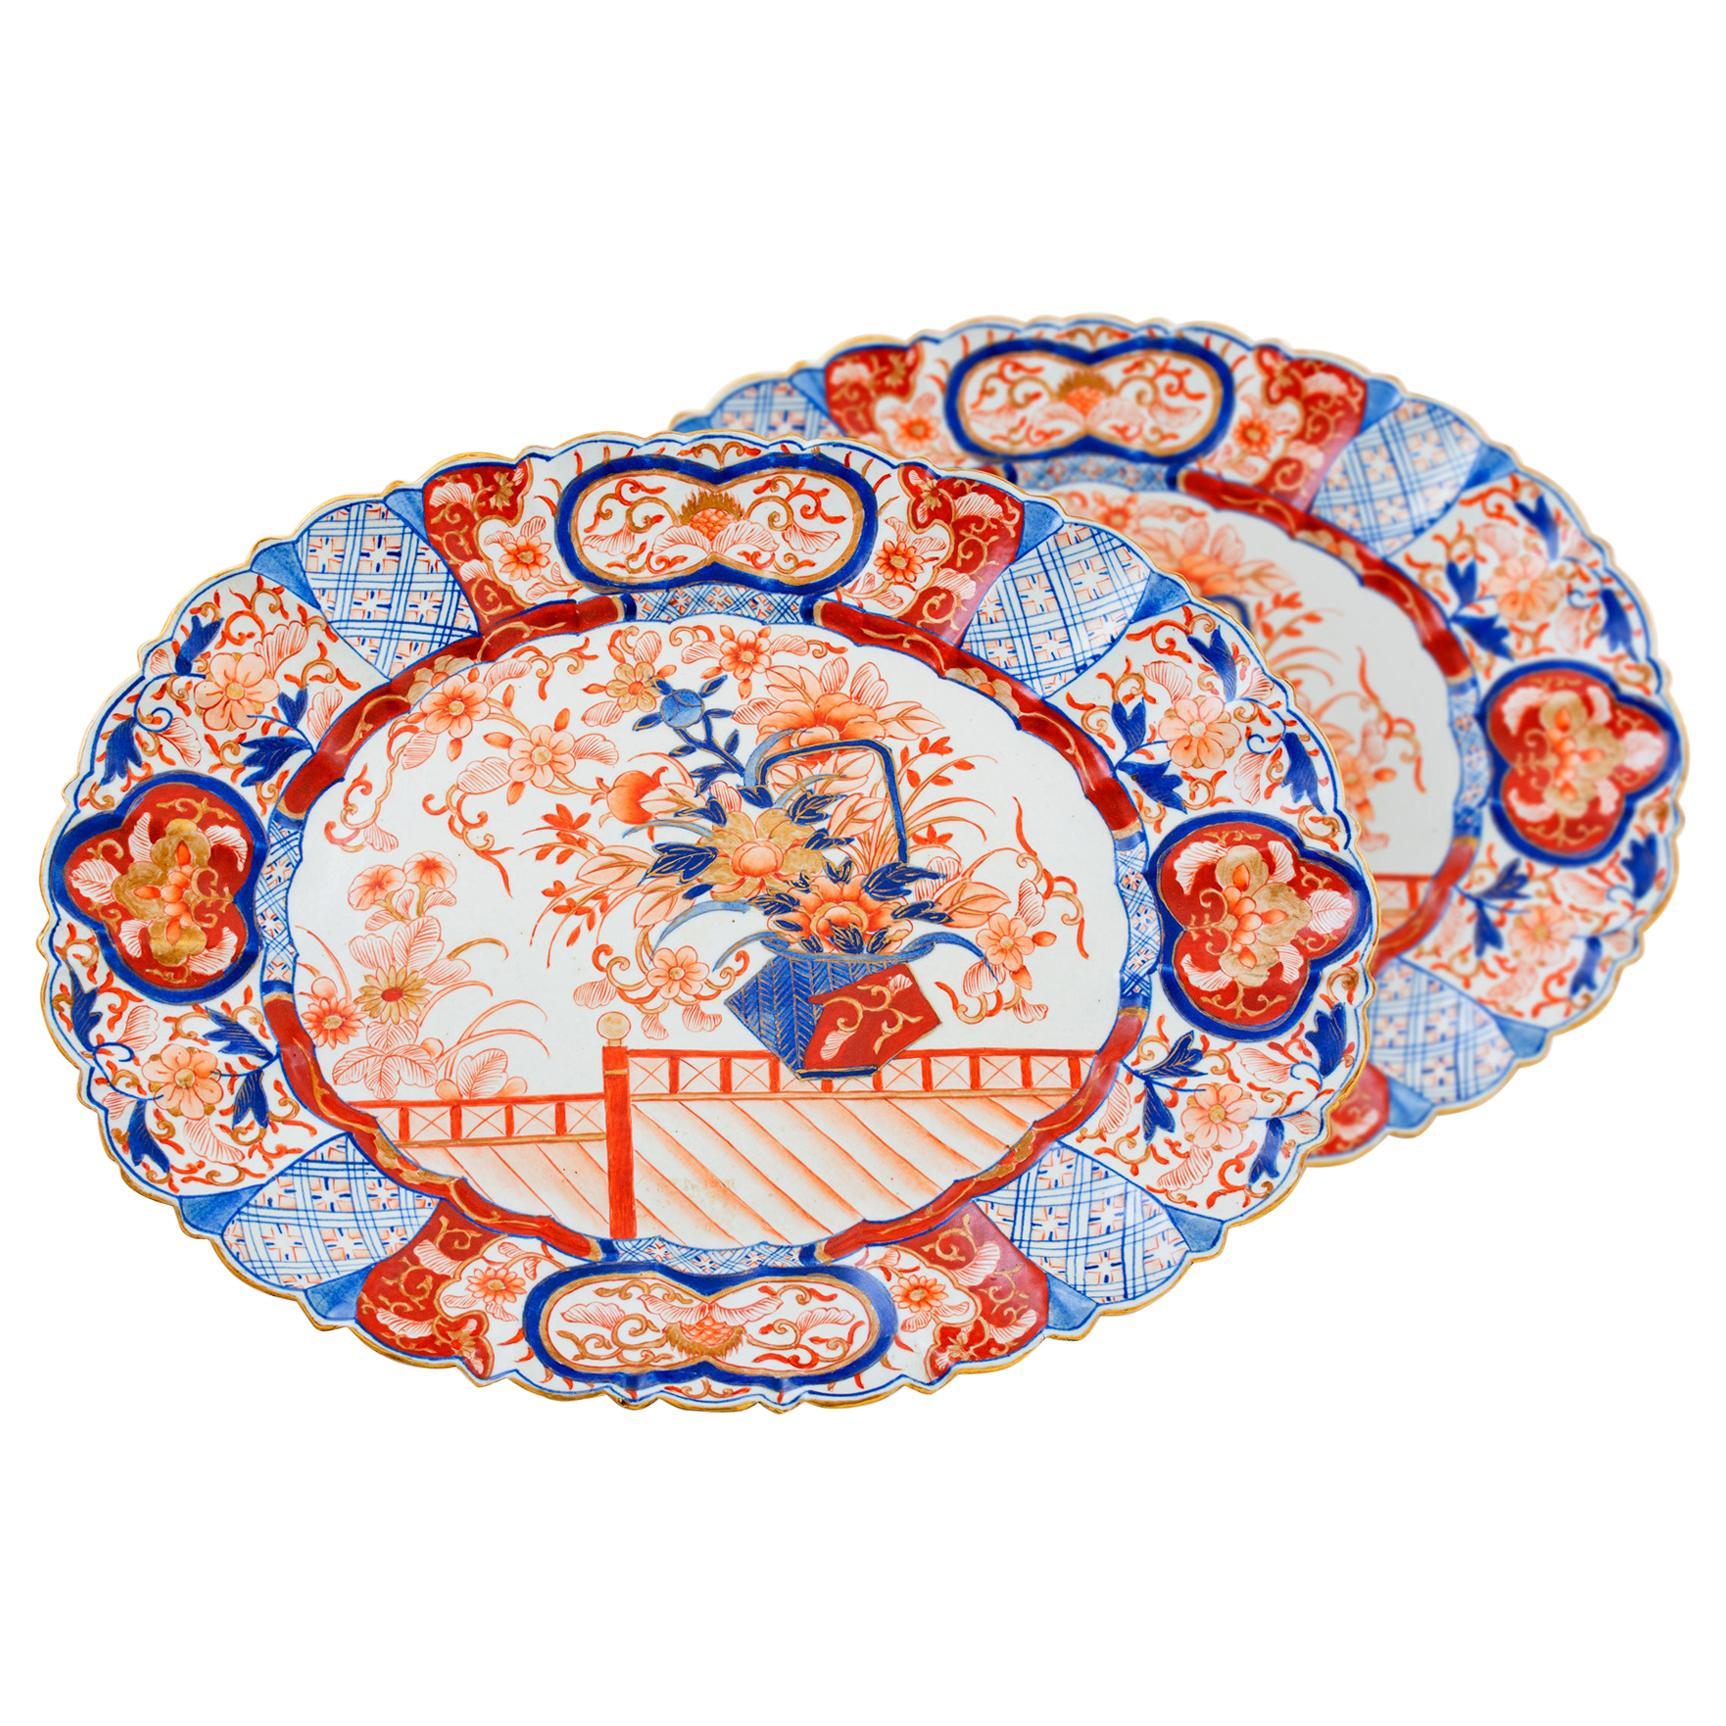 19th Century Oval Imari Platters